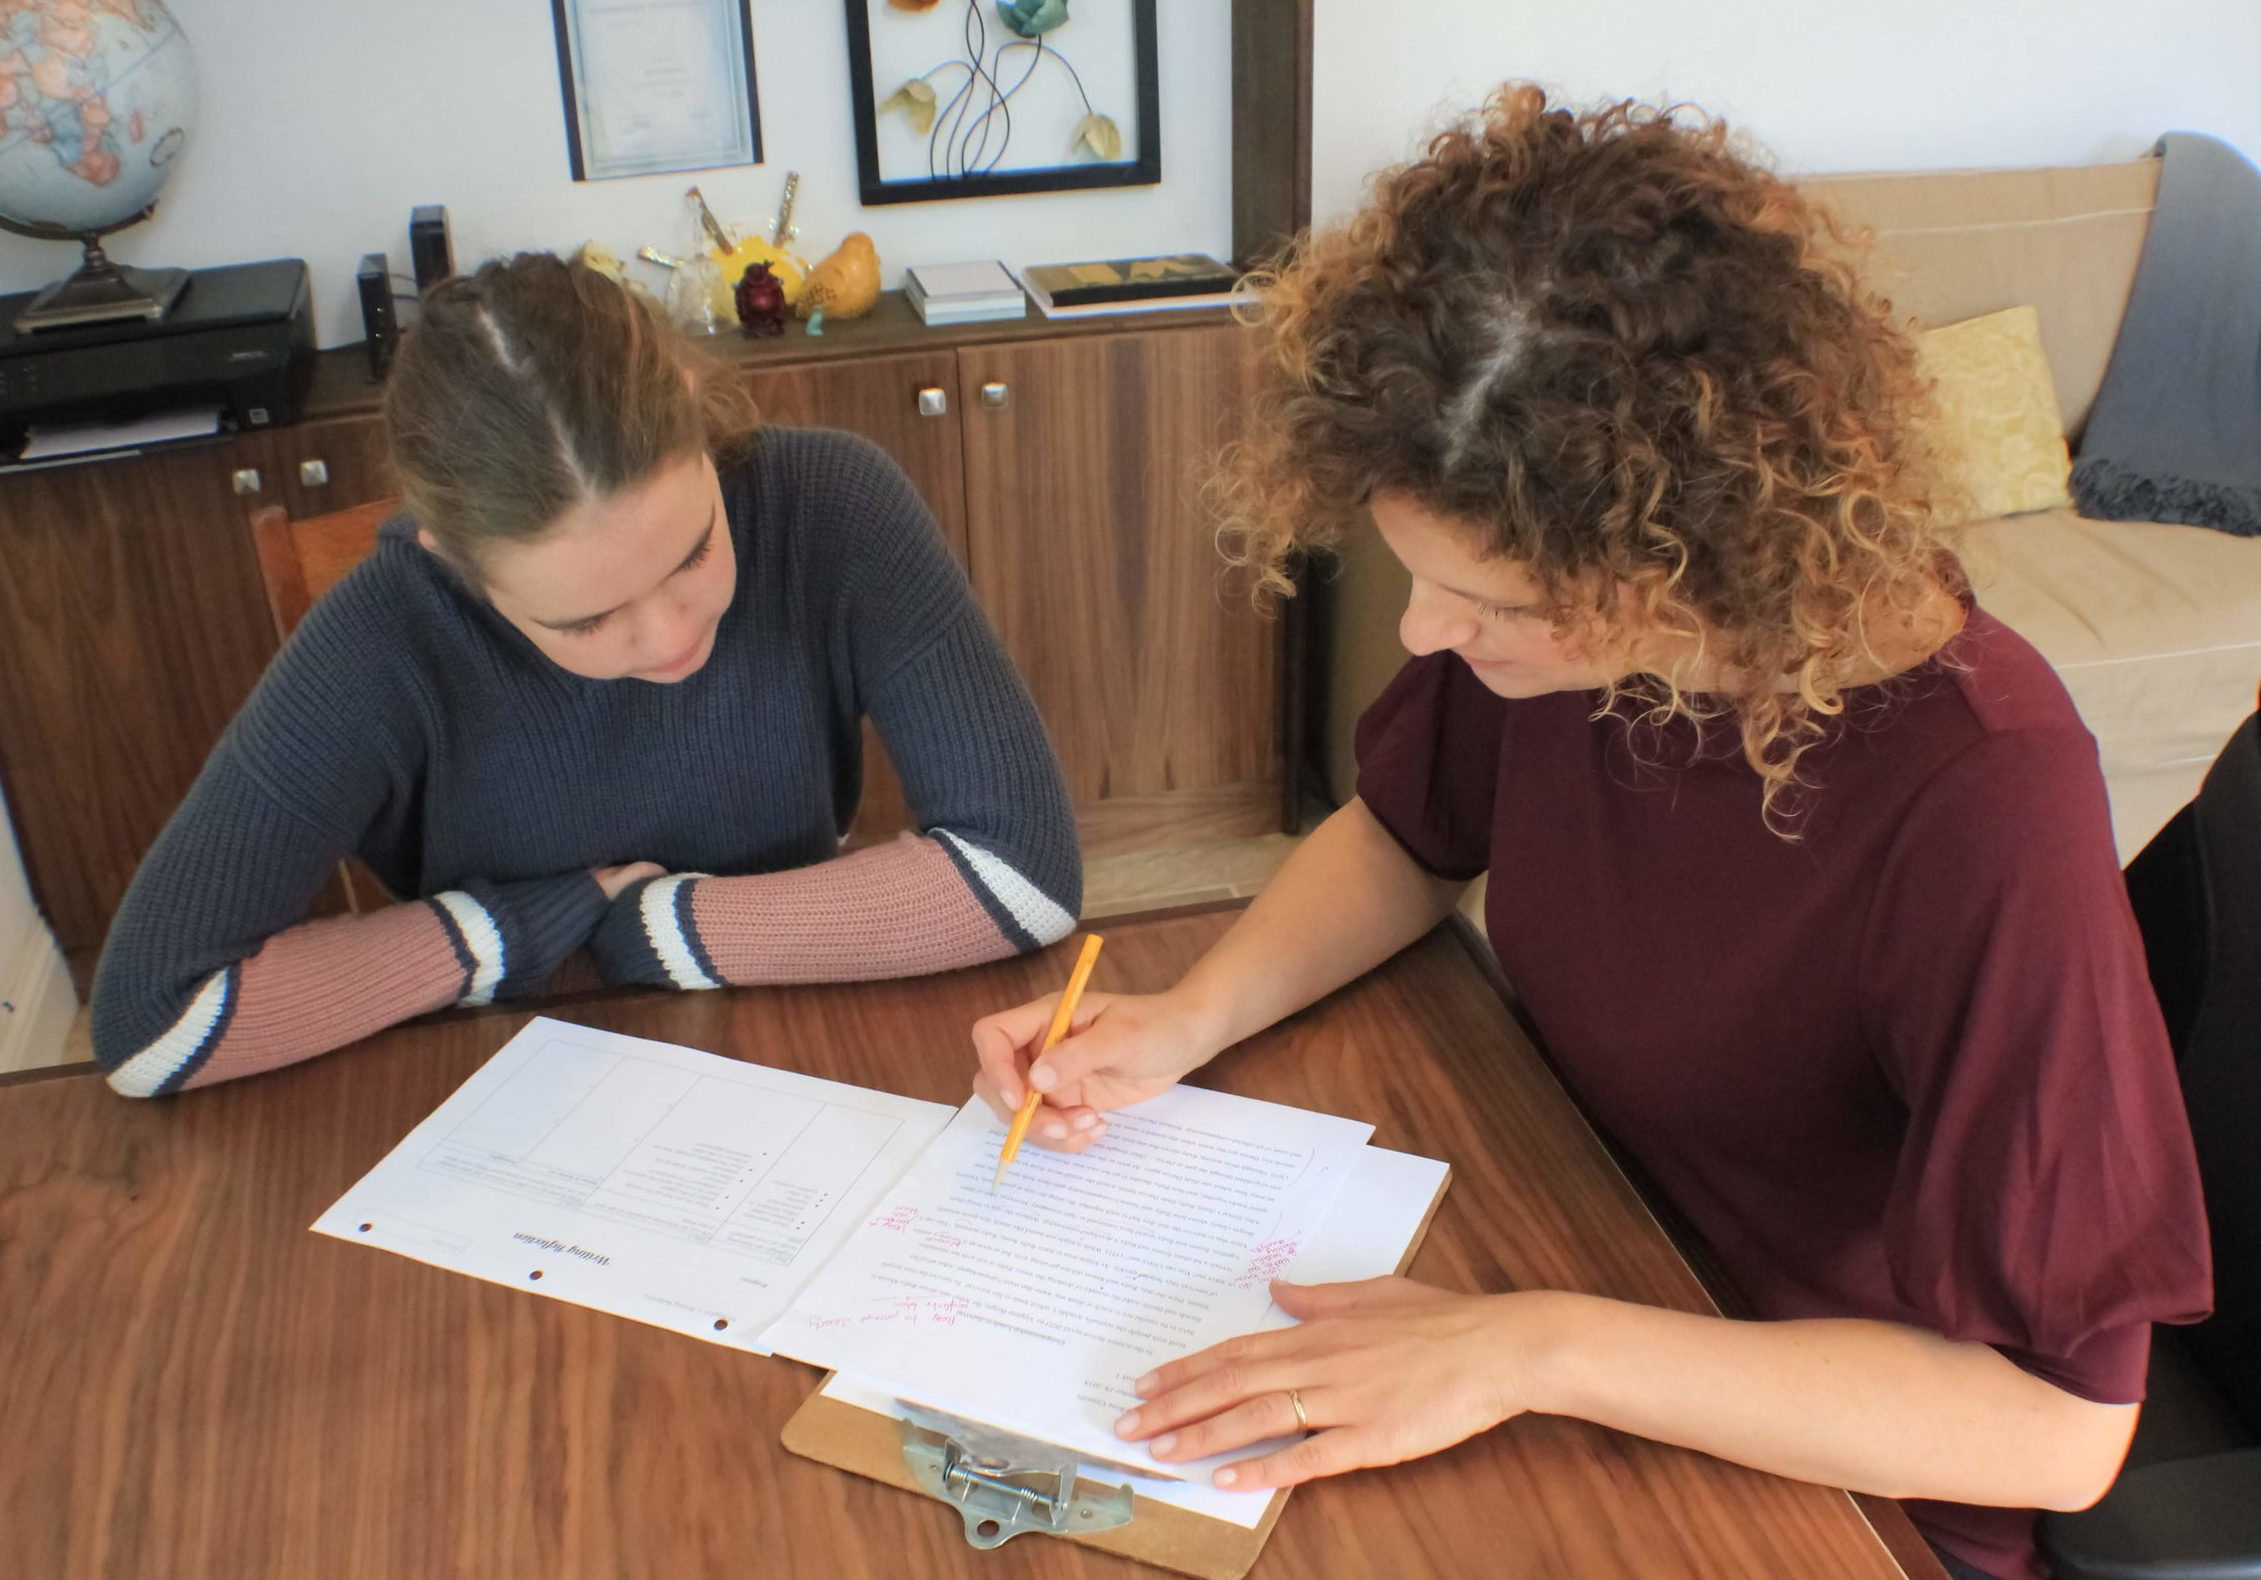 Penny Kostaras Wise Student Lifelong Learners